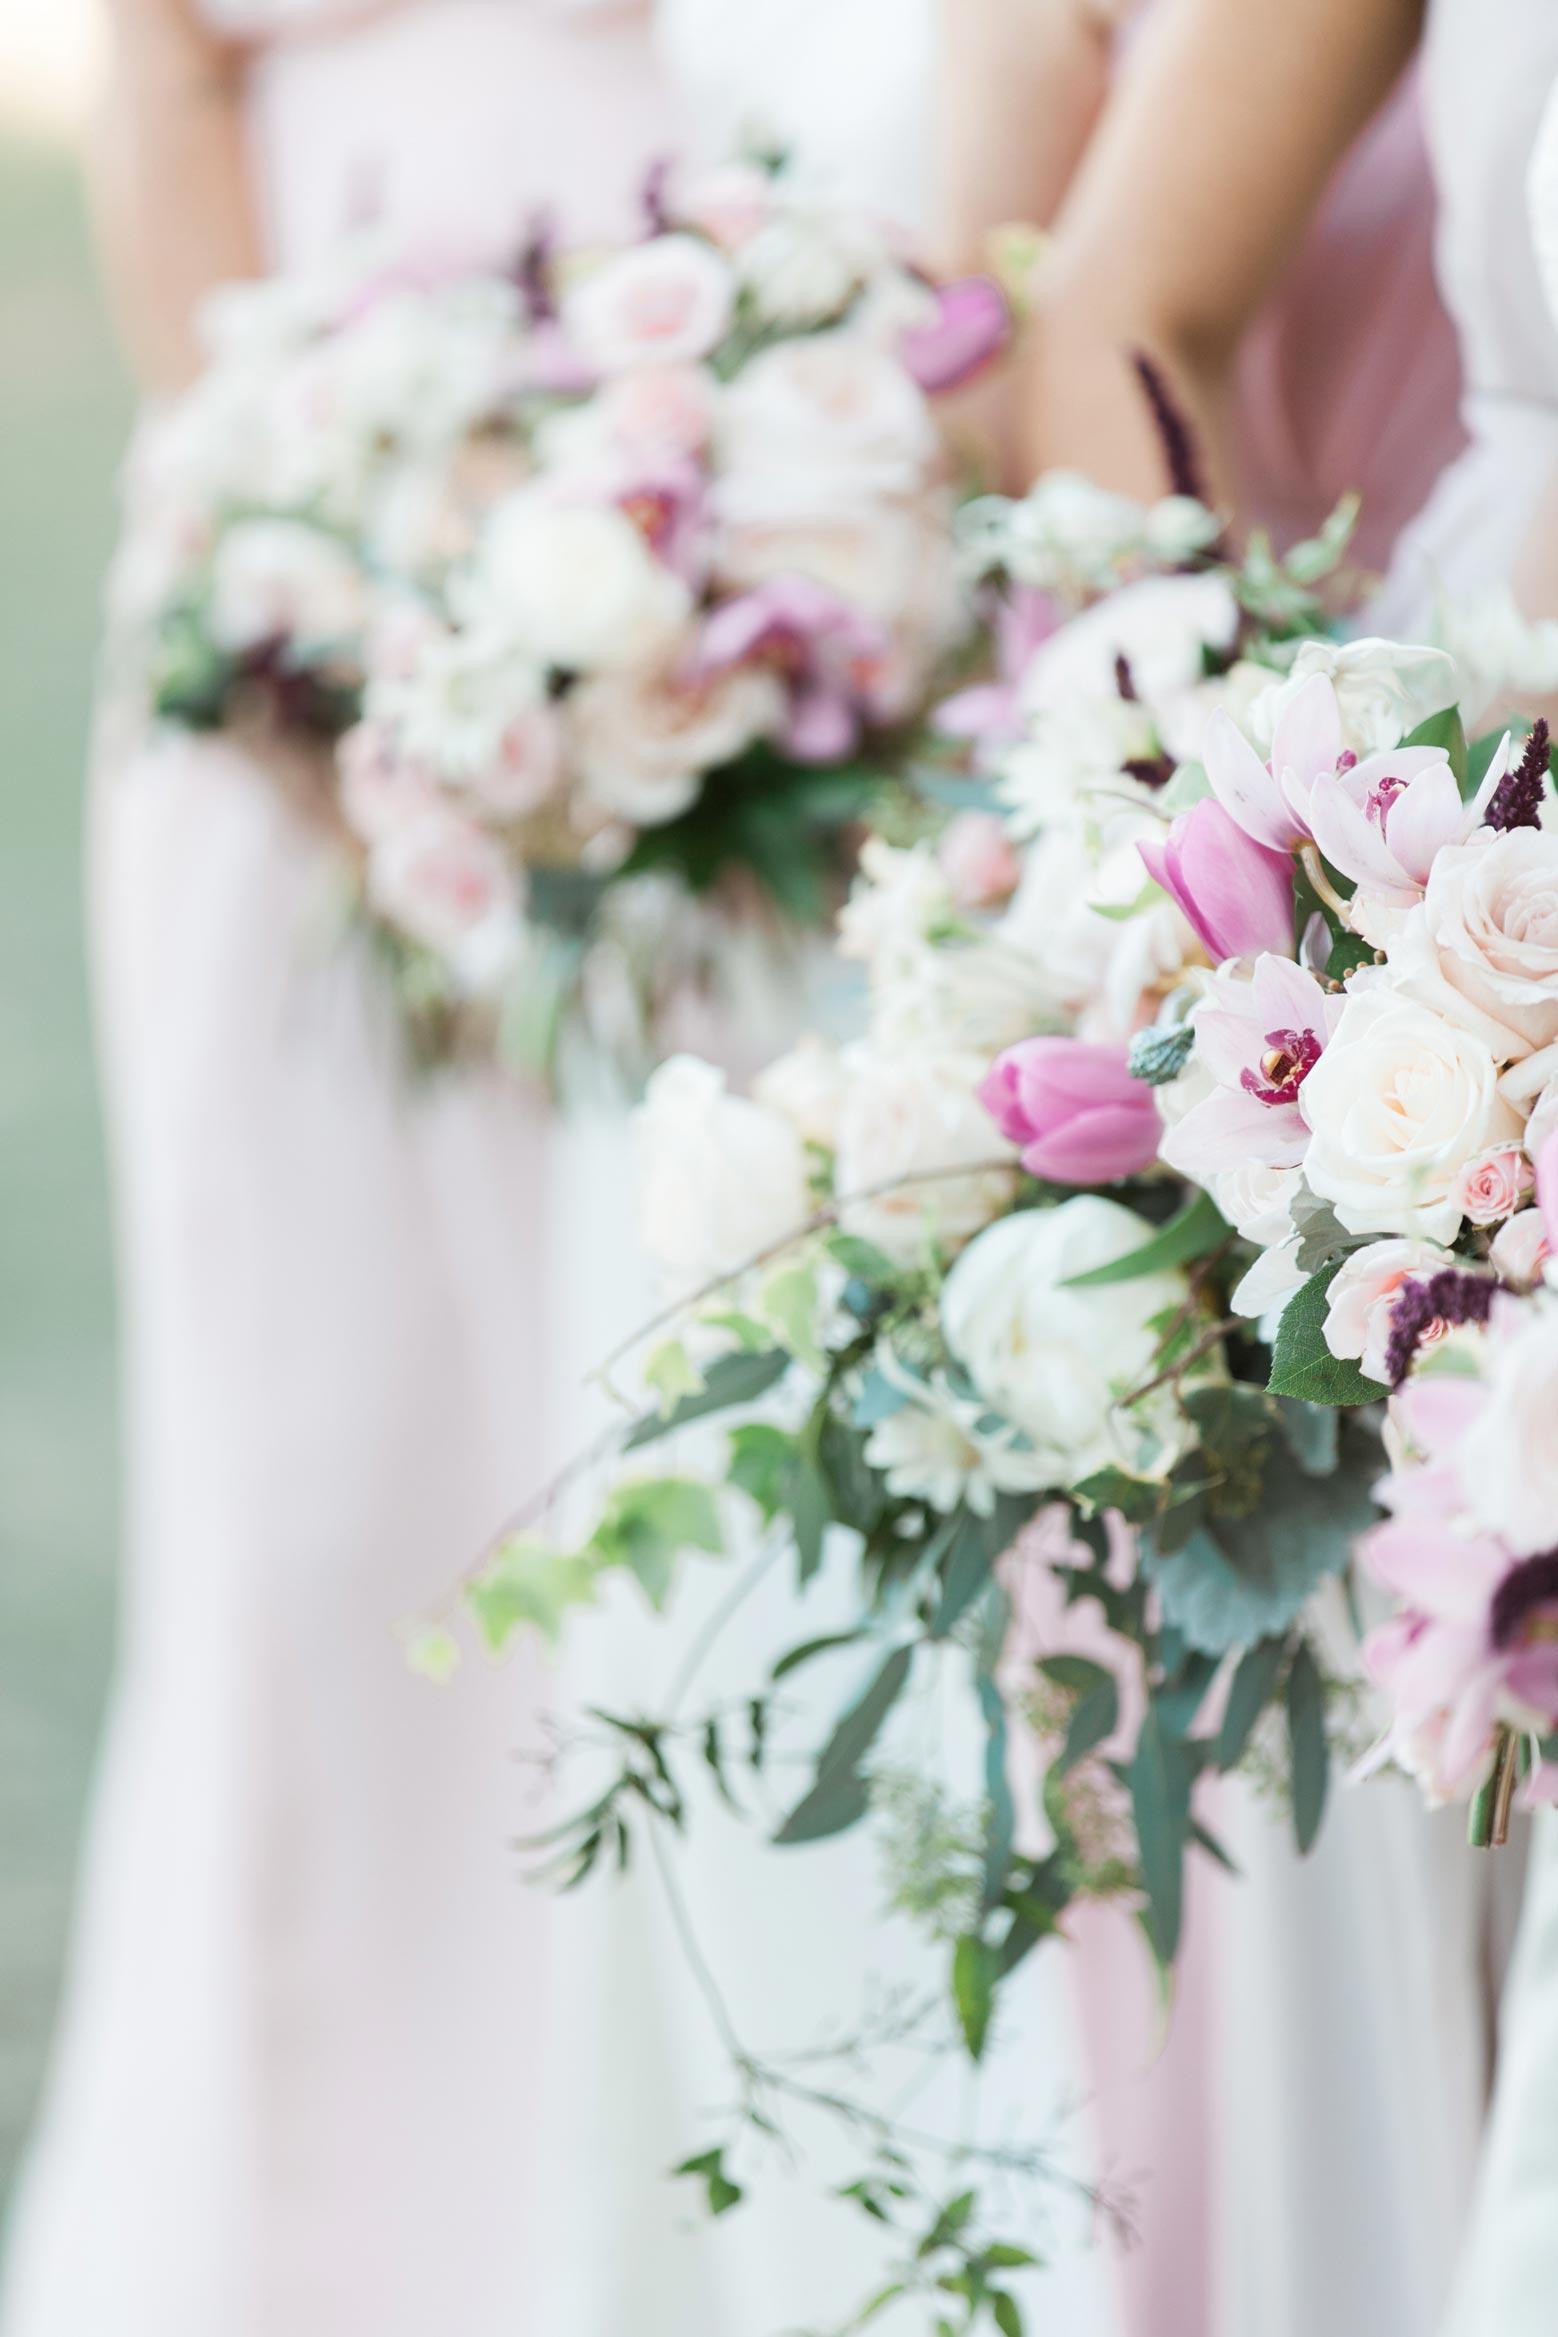 orange-county-fine-art-wedding-photographer-leah-vis-26.jpg